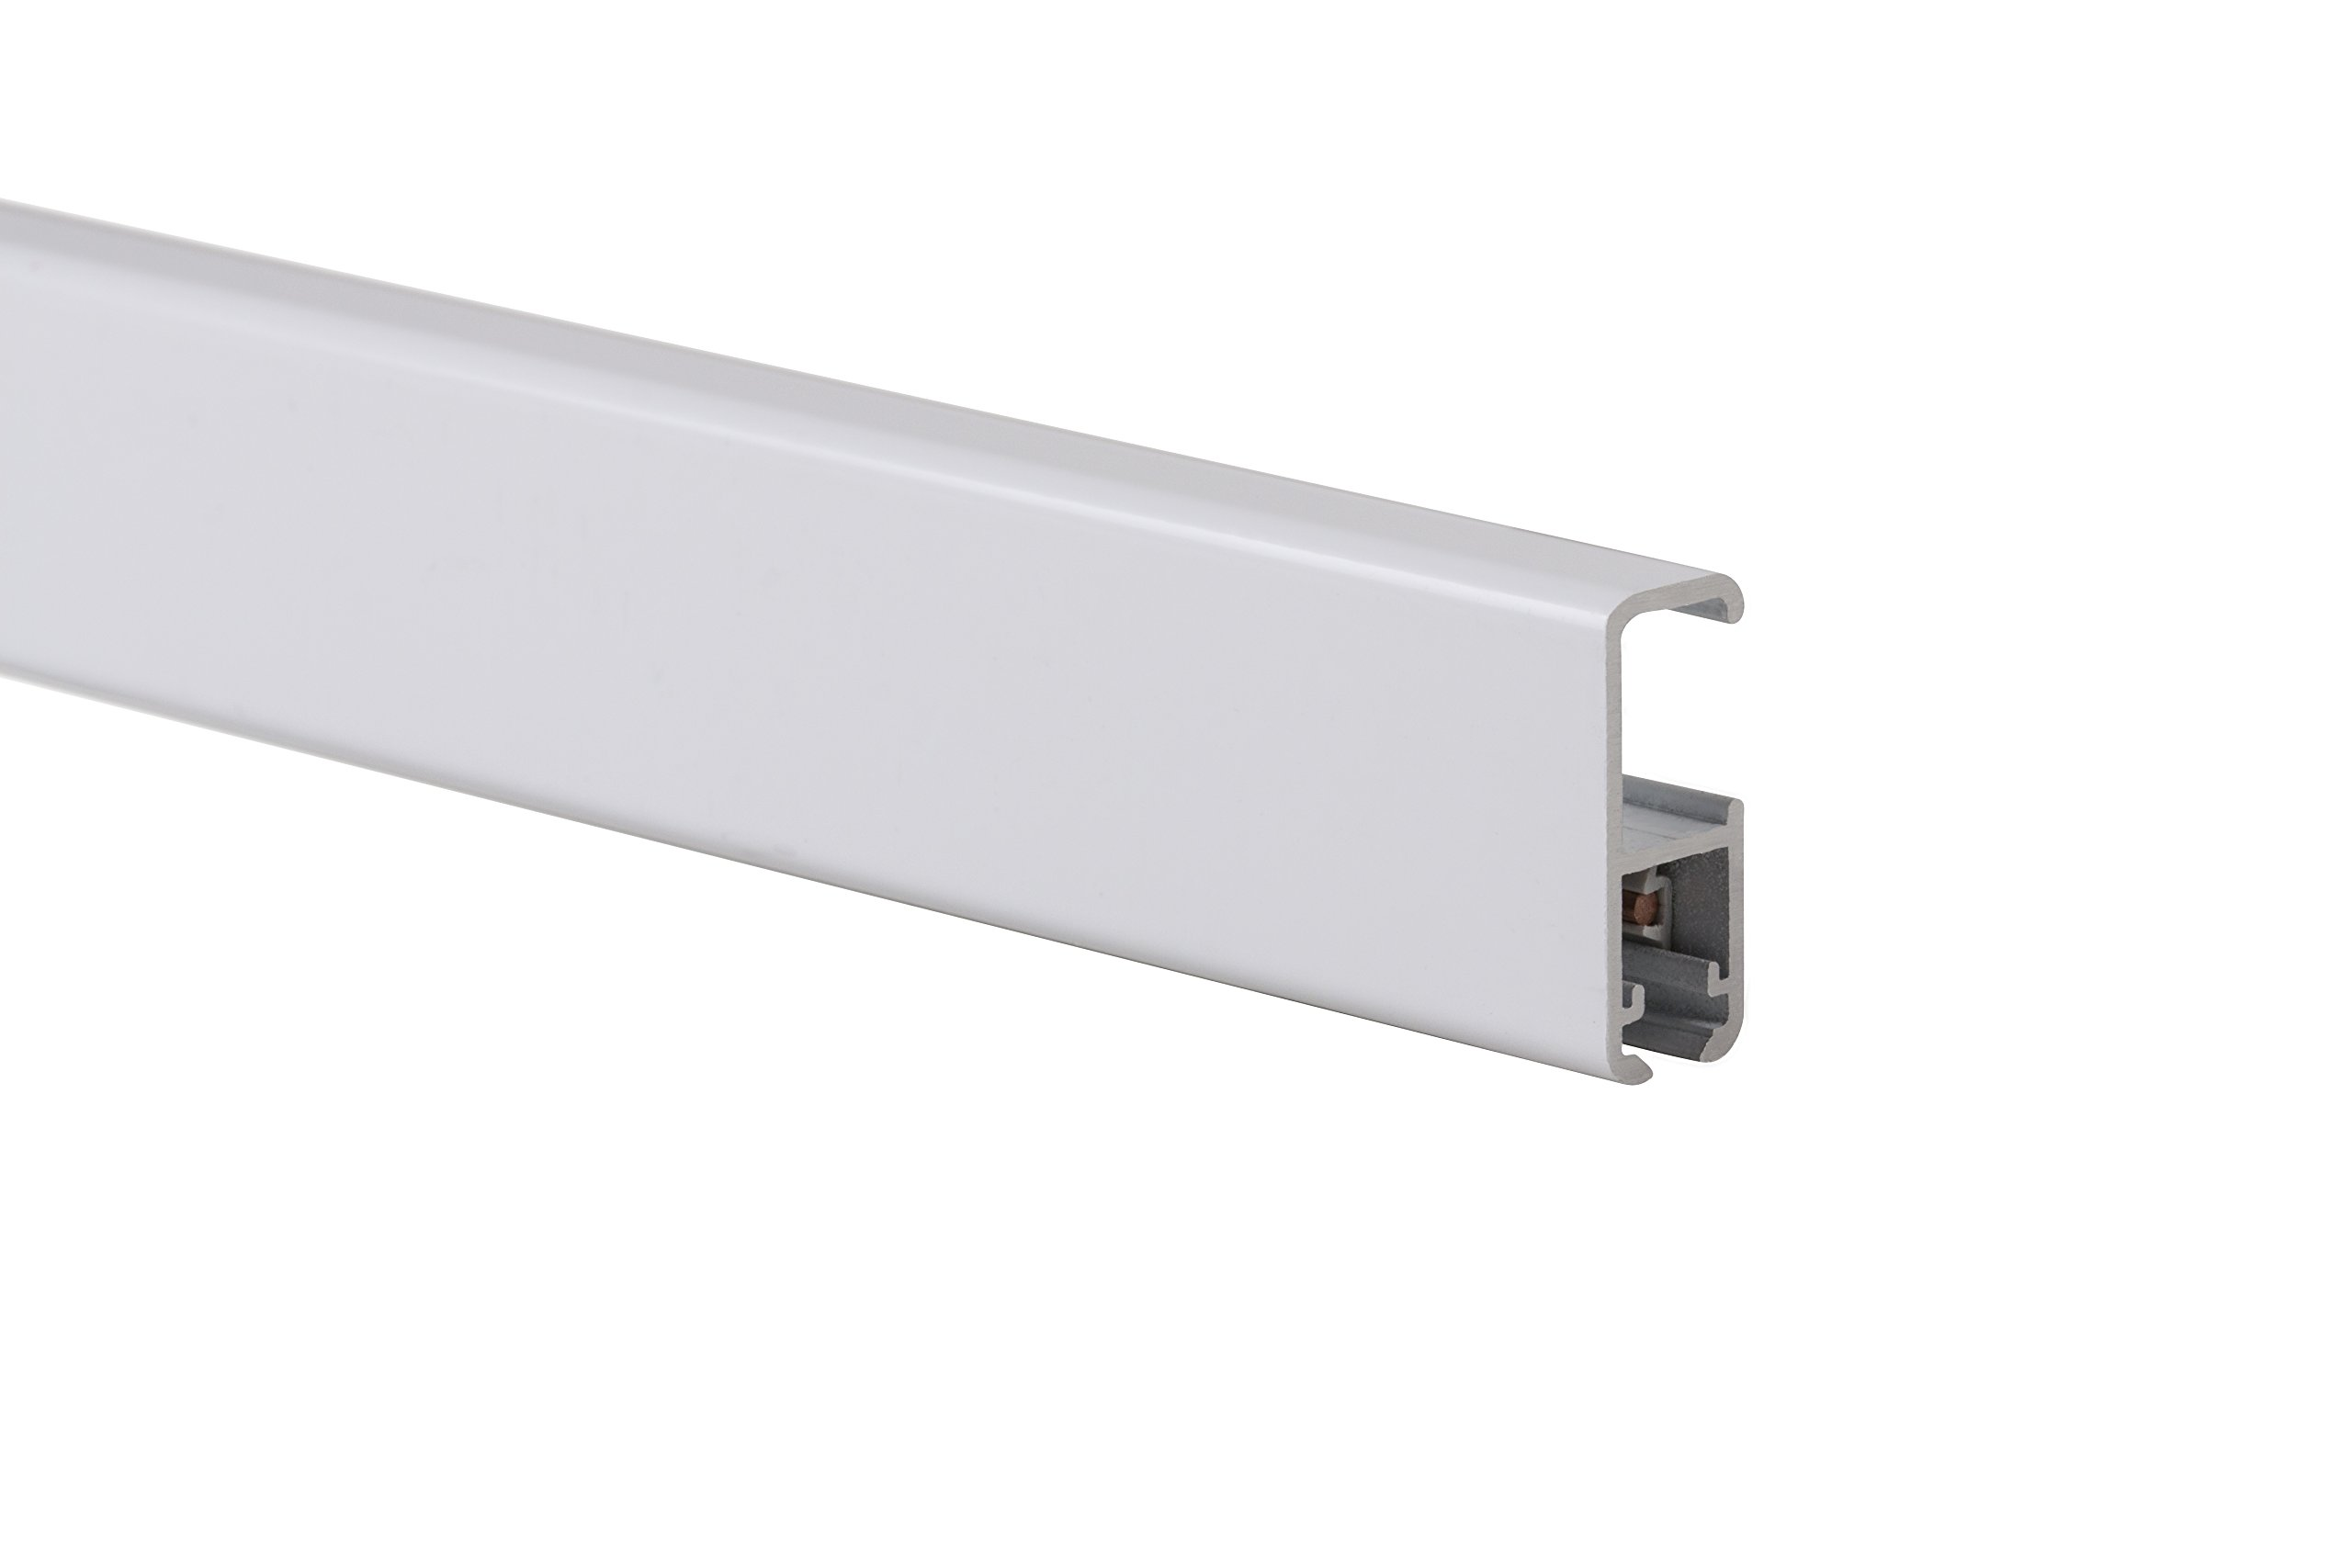 STAS art hanging system: STAS cliprail pro white 200cm 78.75 inch + installation kit